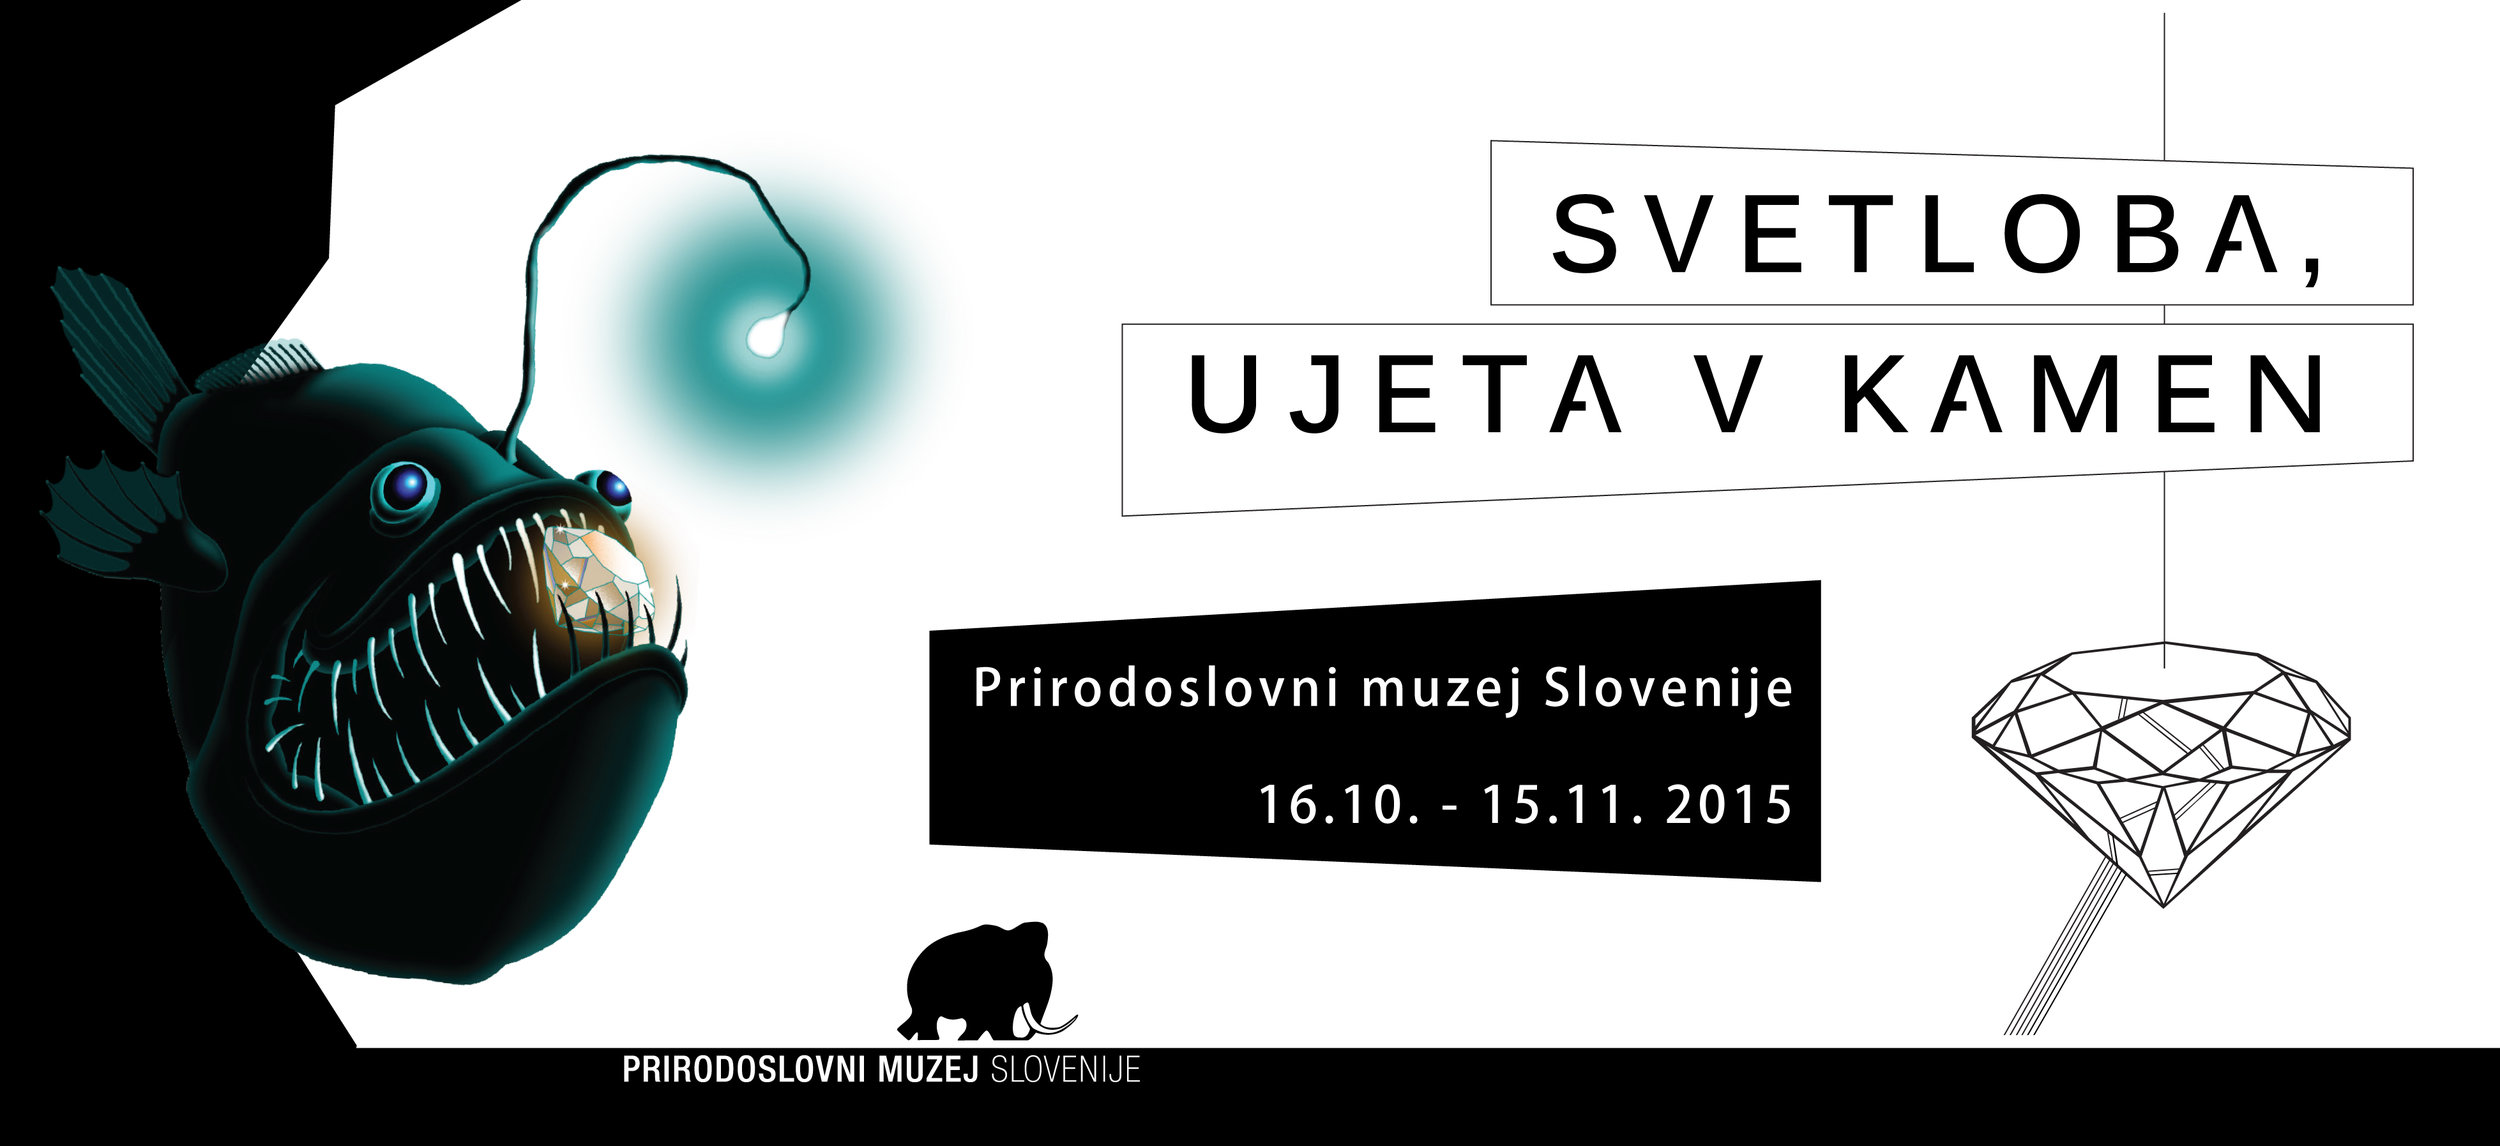 Light, caught in stone - Group exhibition show / Slovenian Museum of National History16. October - 15. November 2015 / Ljubljana / Slovenia